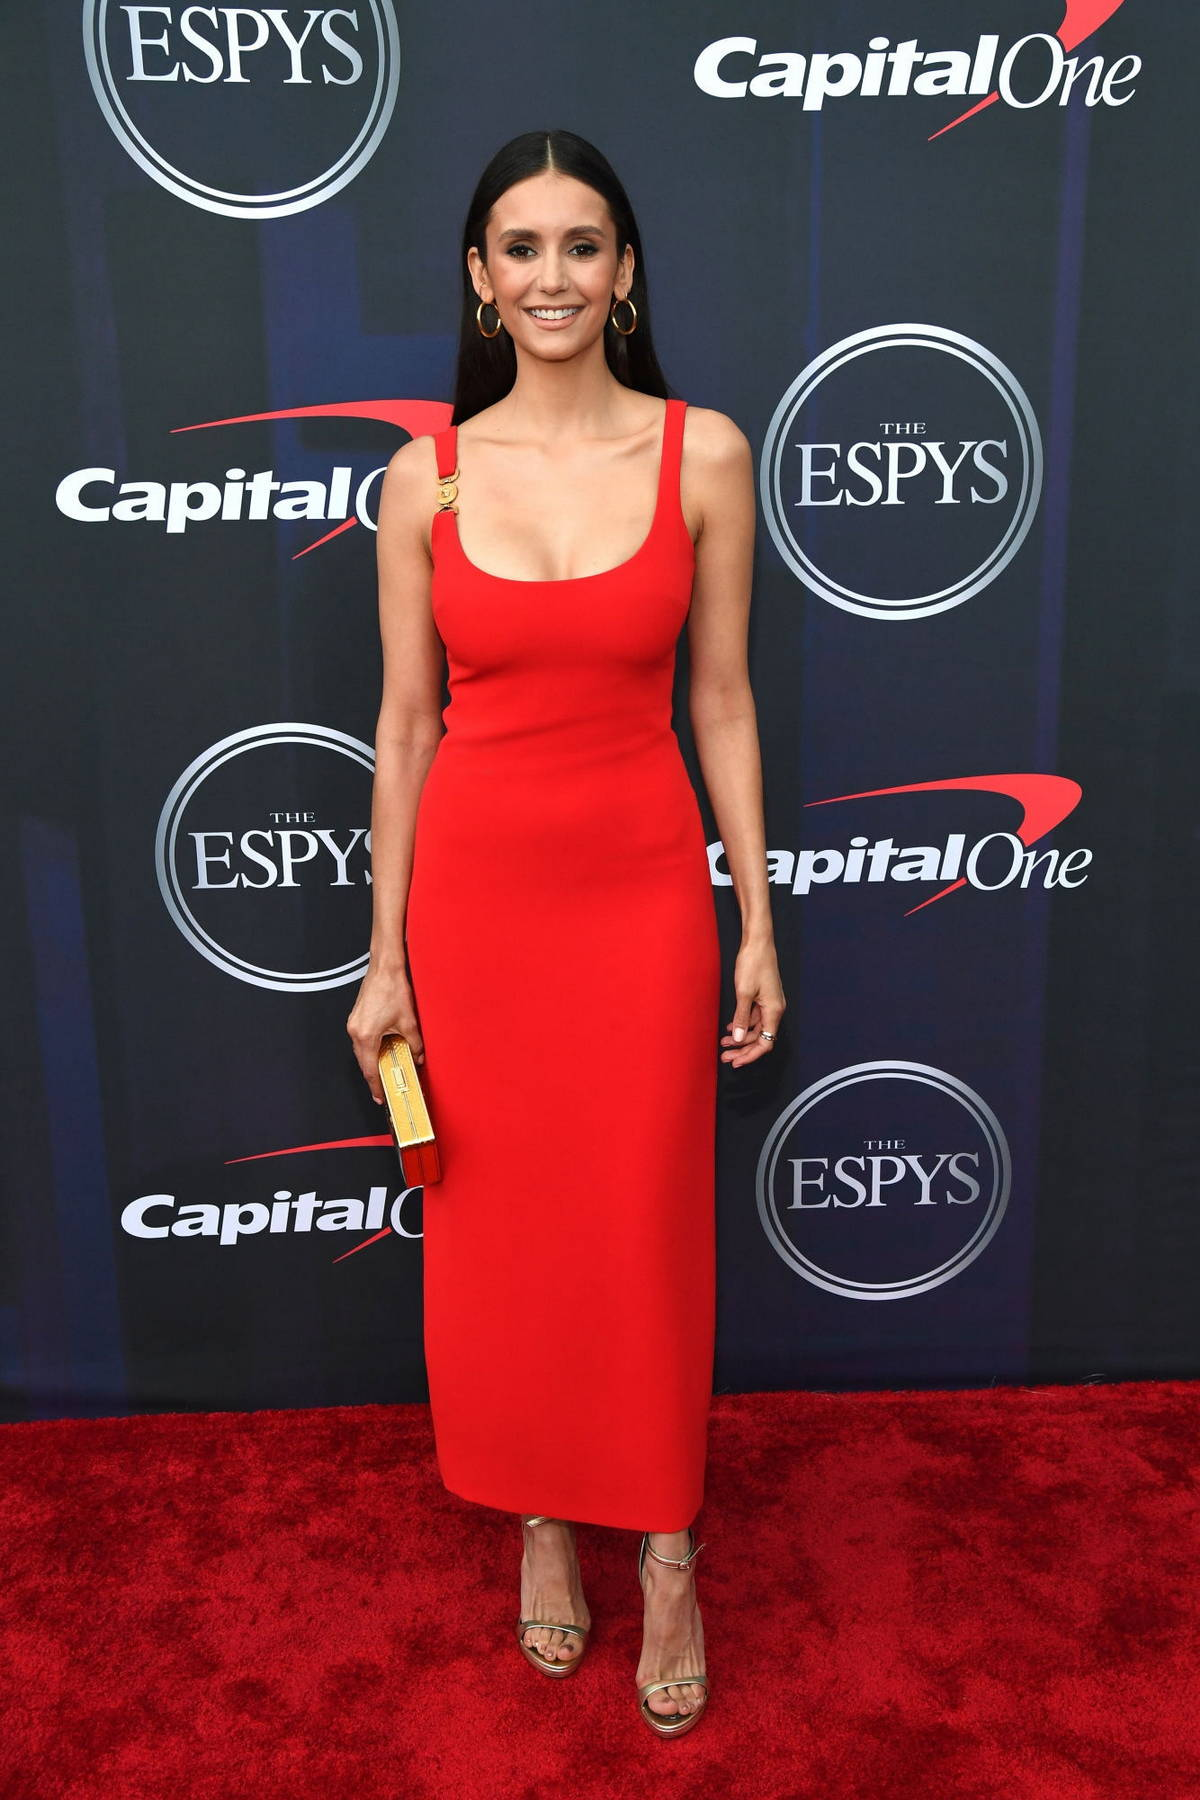 Nina Dobrev attends the 2021 ESPY Awards at Rooftop At Pier 17 in New York City